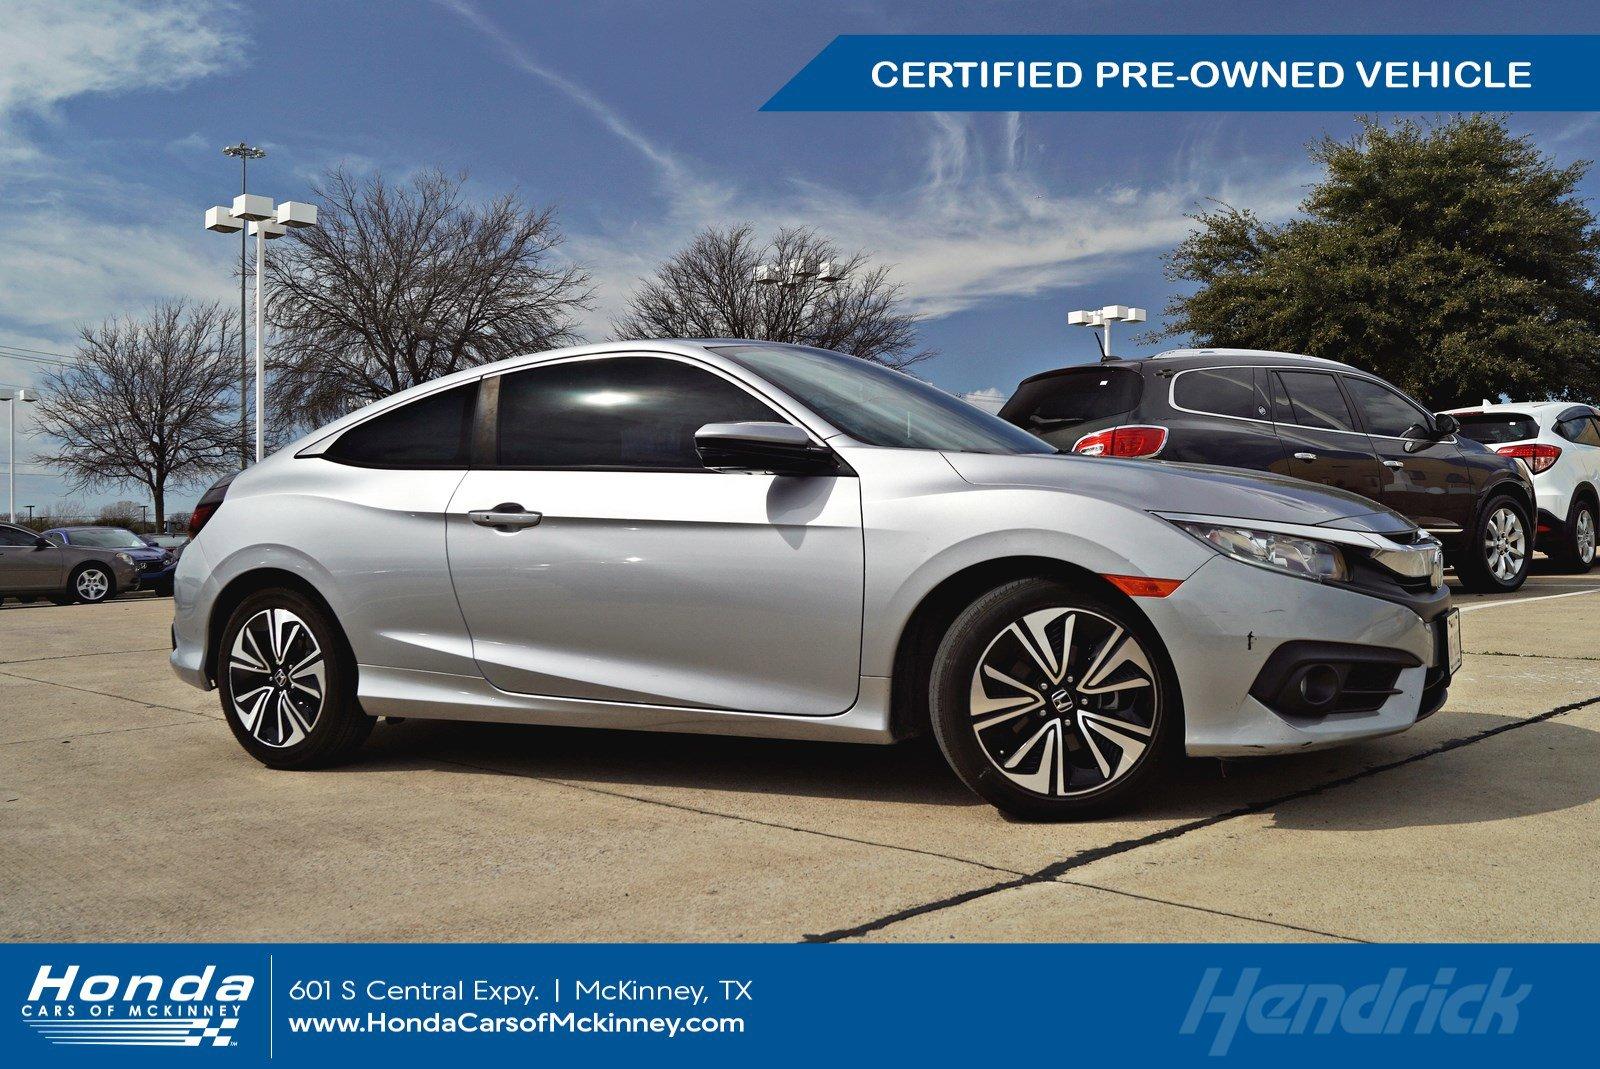 2017 Honda Civic EX-T Coupe image